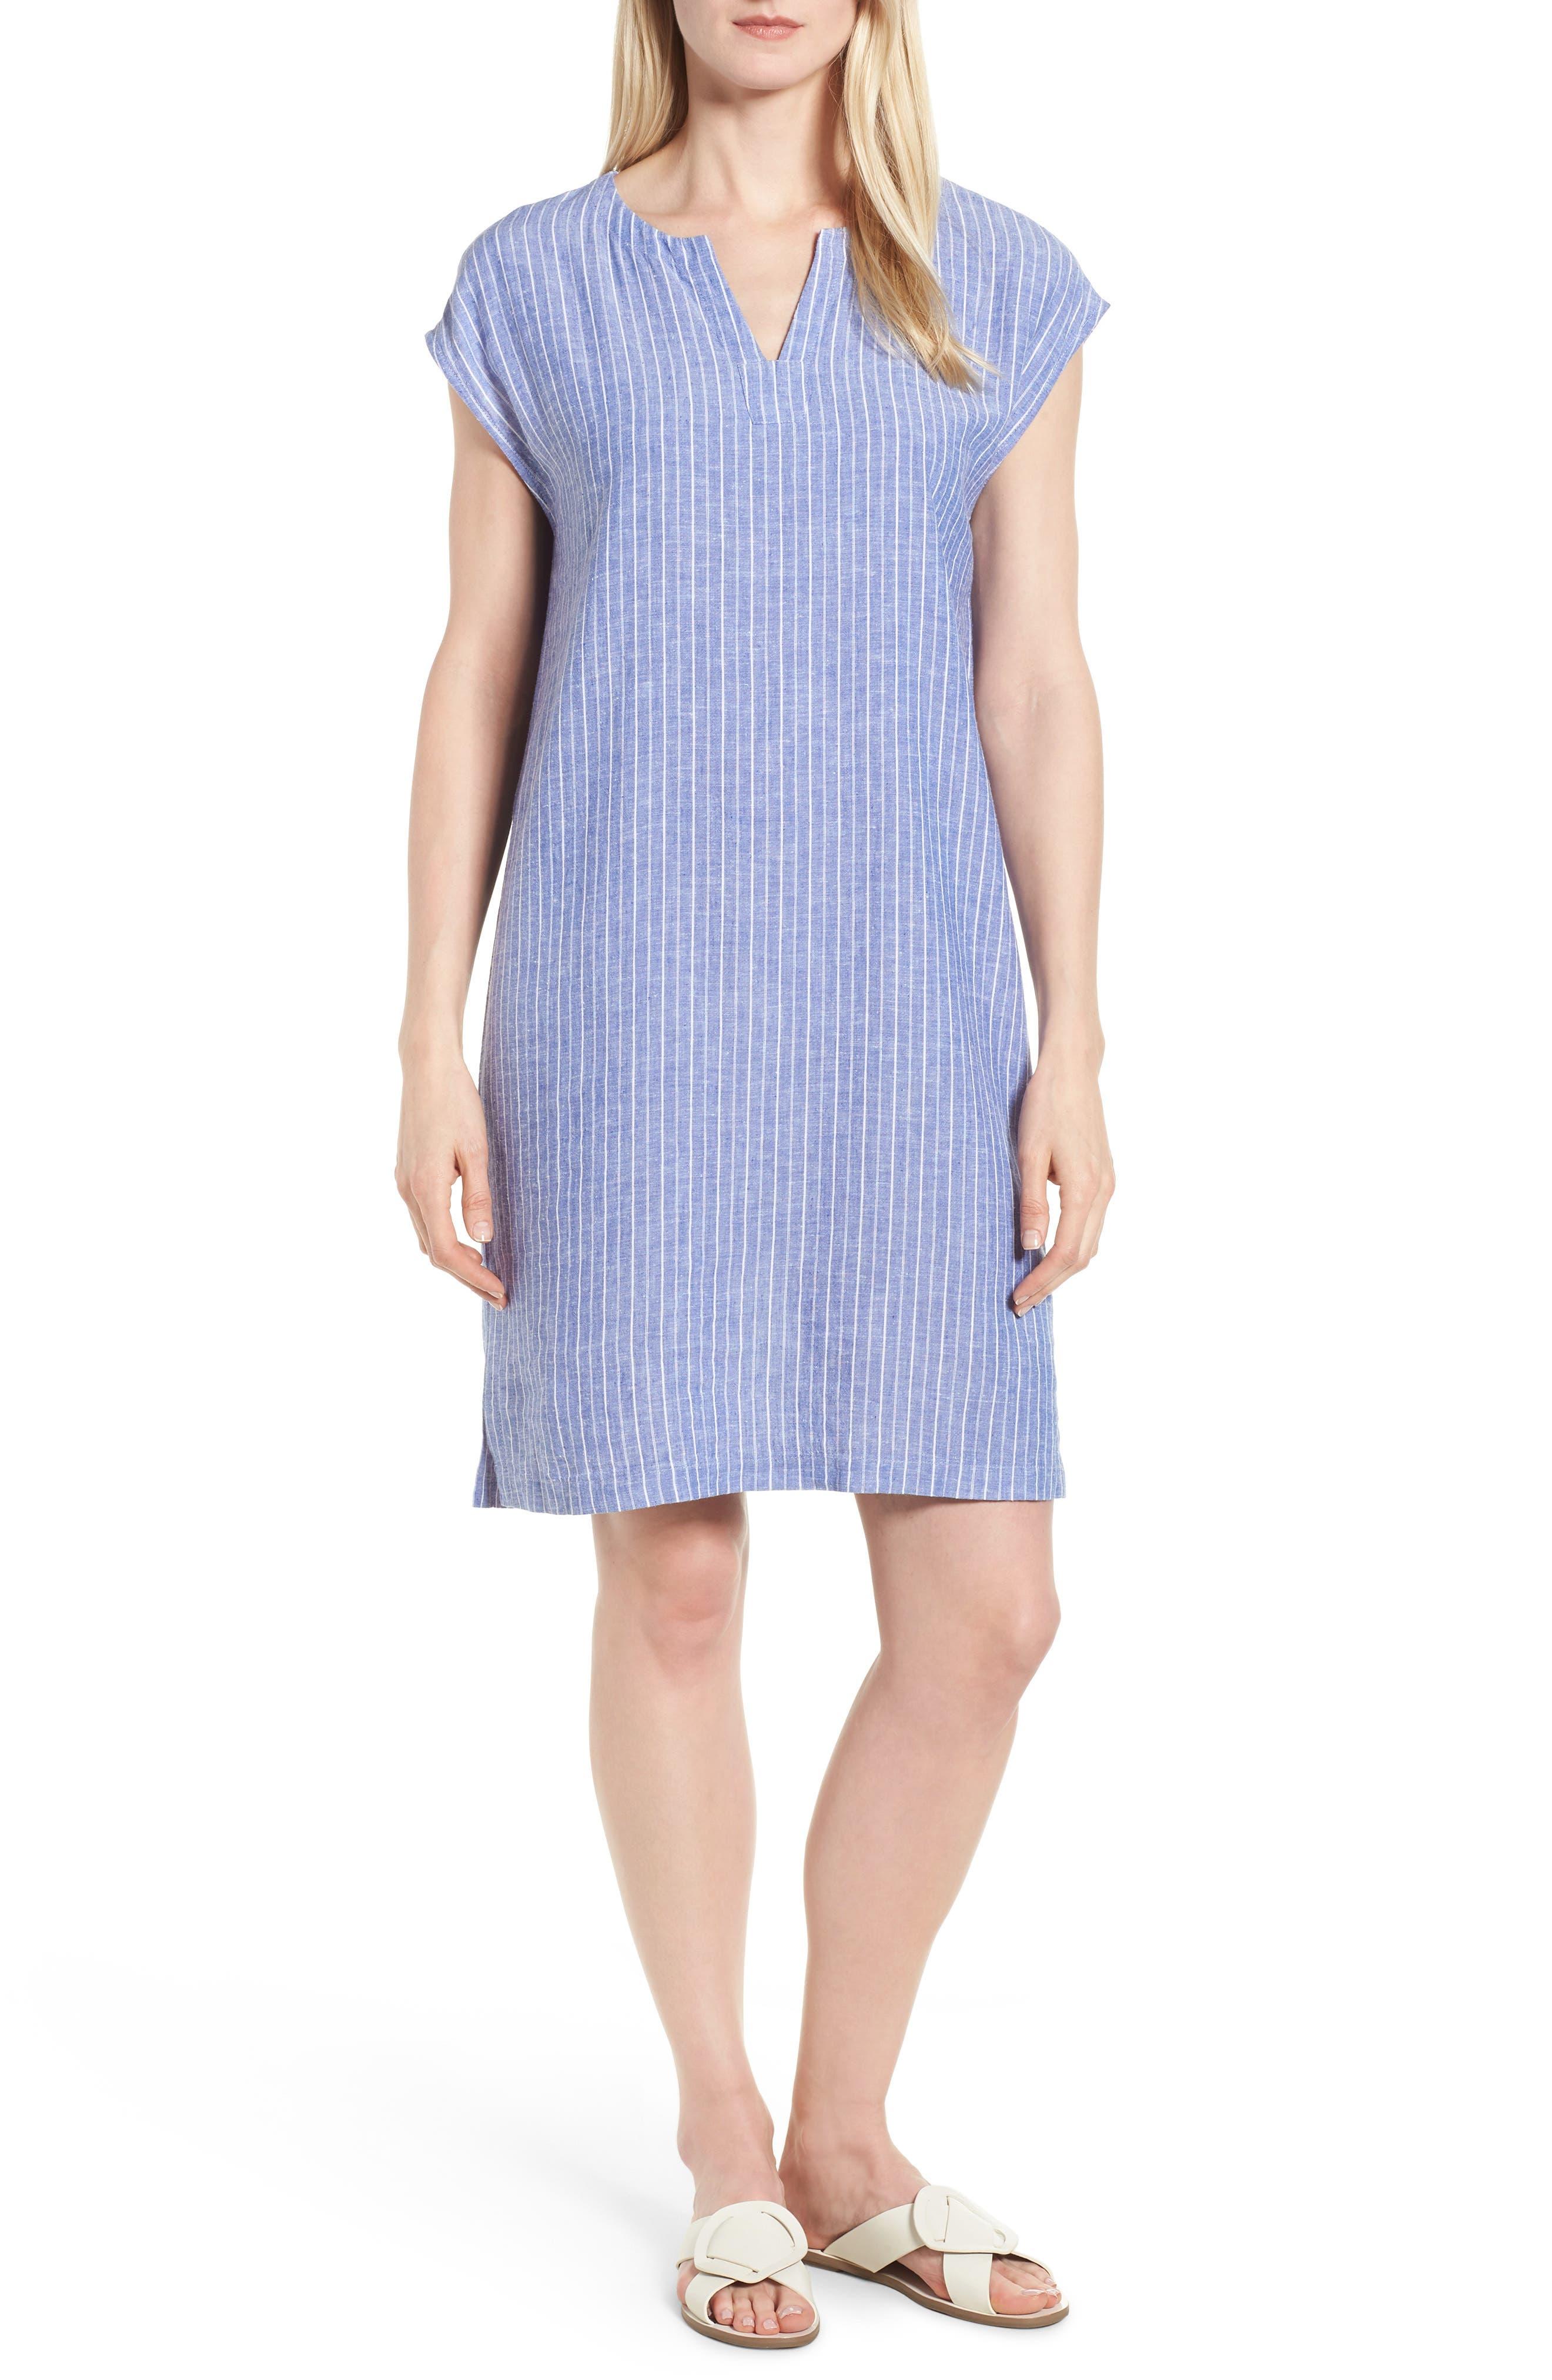 Detour Dress,                         Main,                         color, Ultramarine